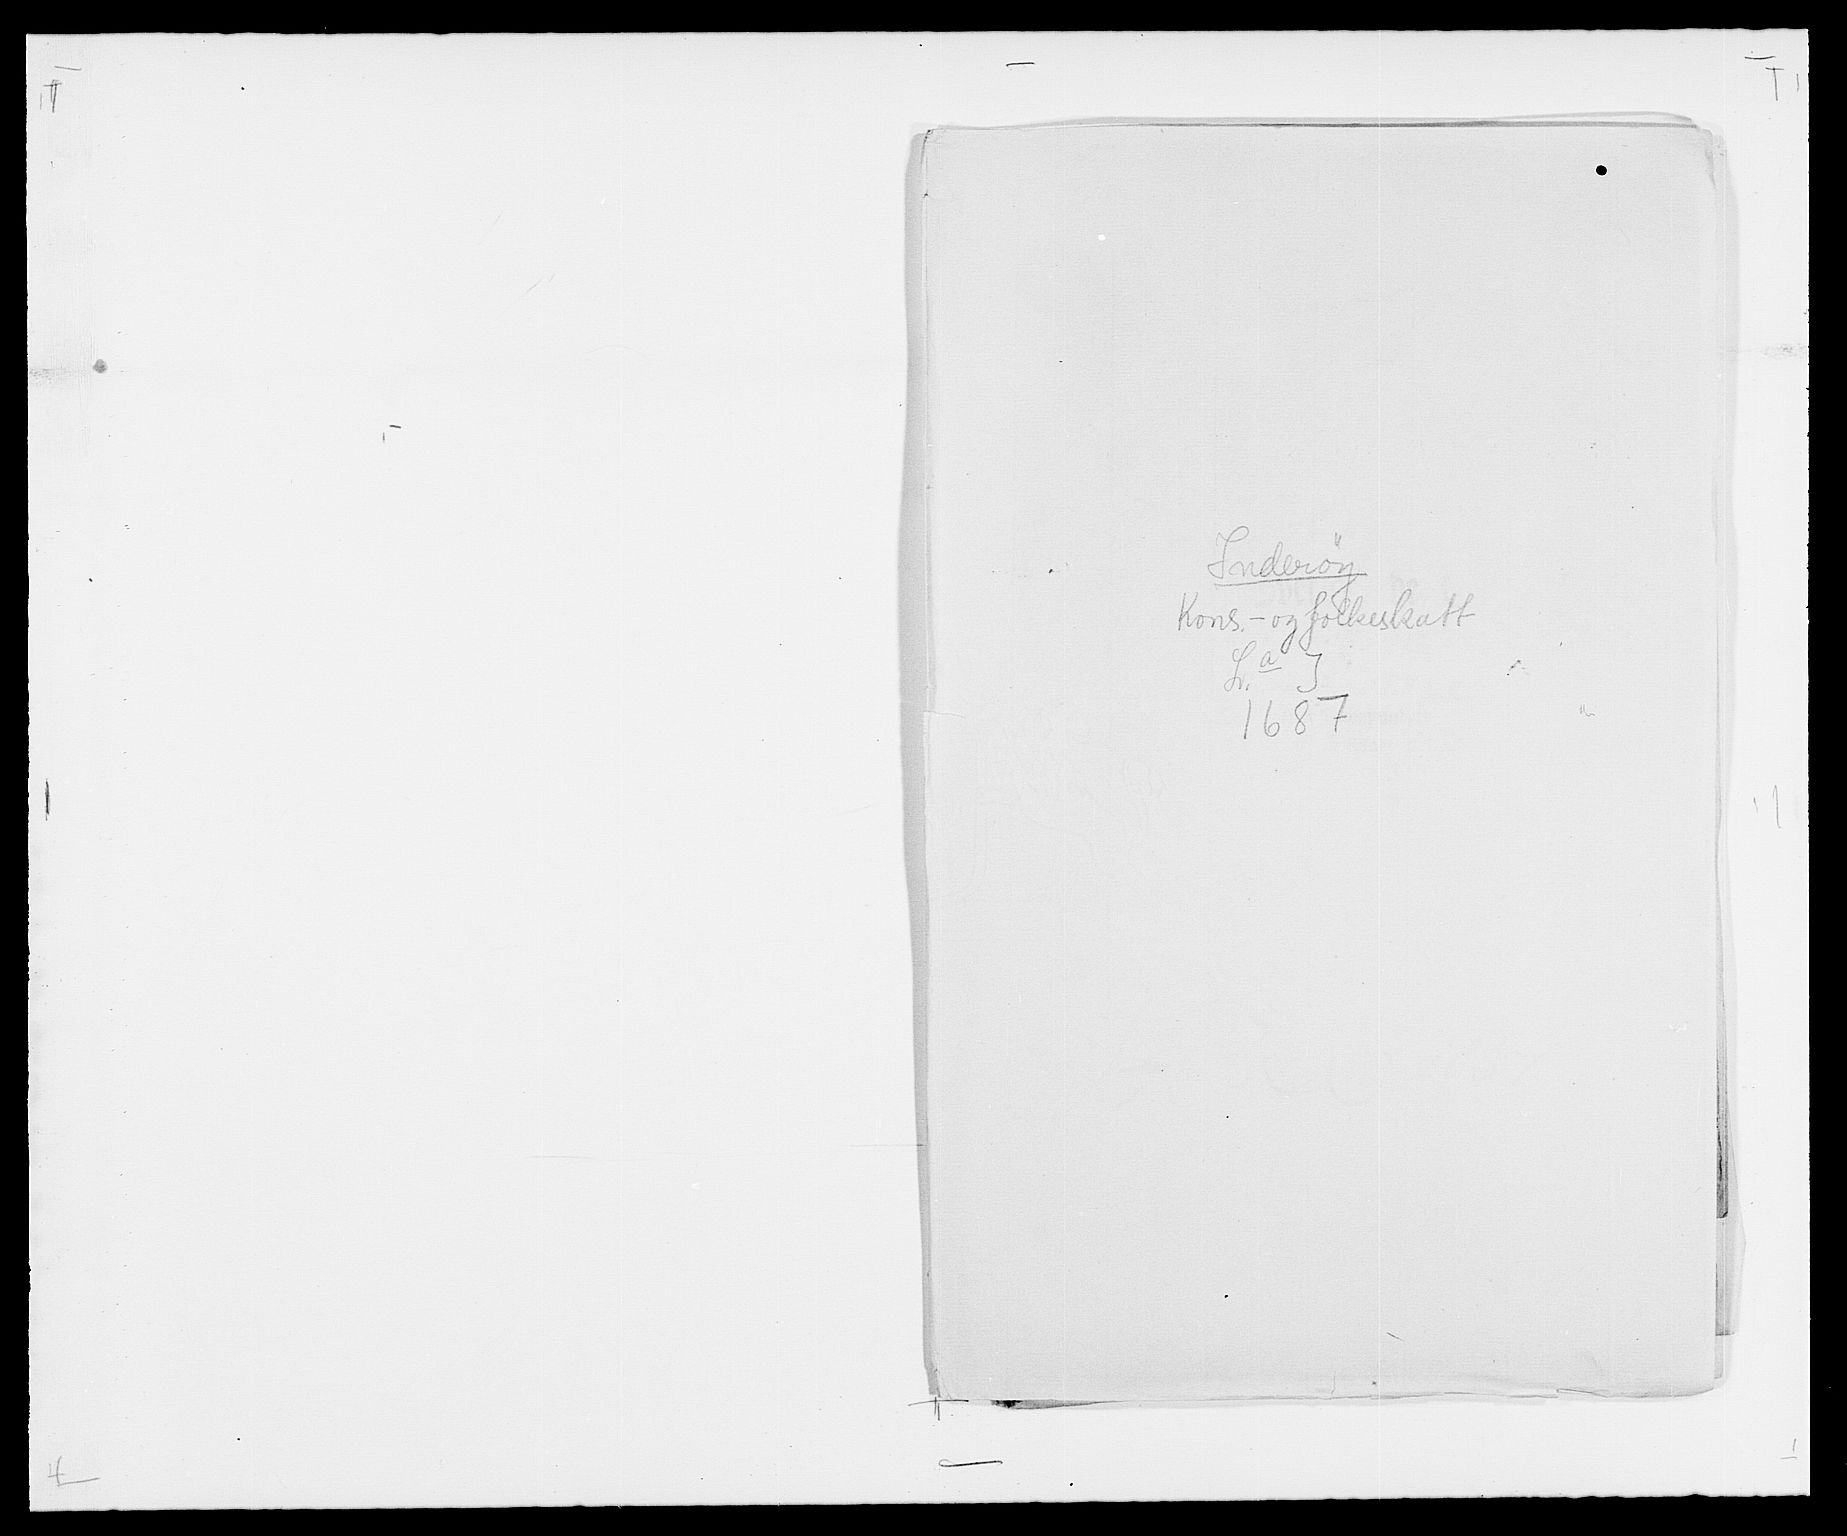 RA, Rentekammeret inntil 1814, Reviderte regnskaper, Fogderegnskap, R63/L4306: Fogderegnskap Inderøy, 1687-1689, s. 120